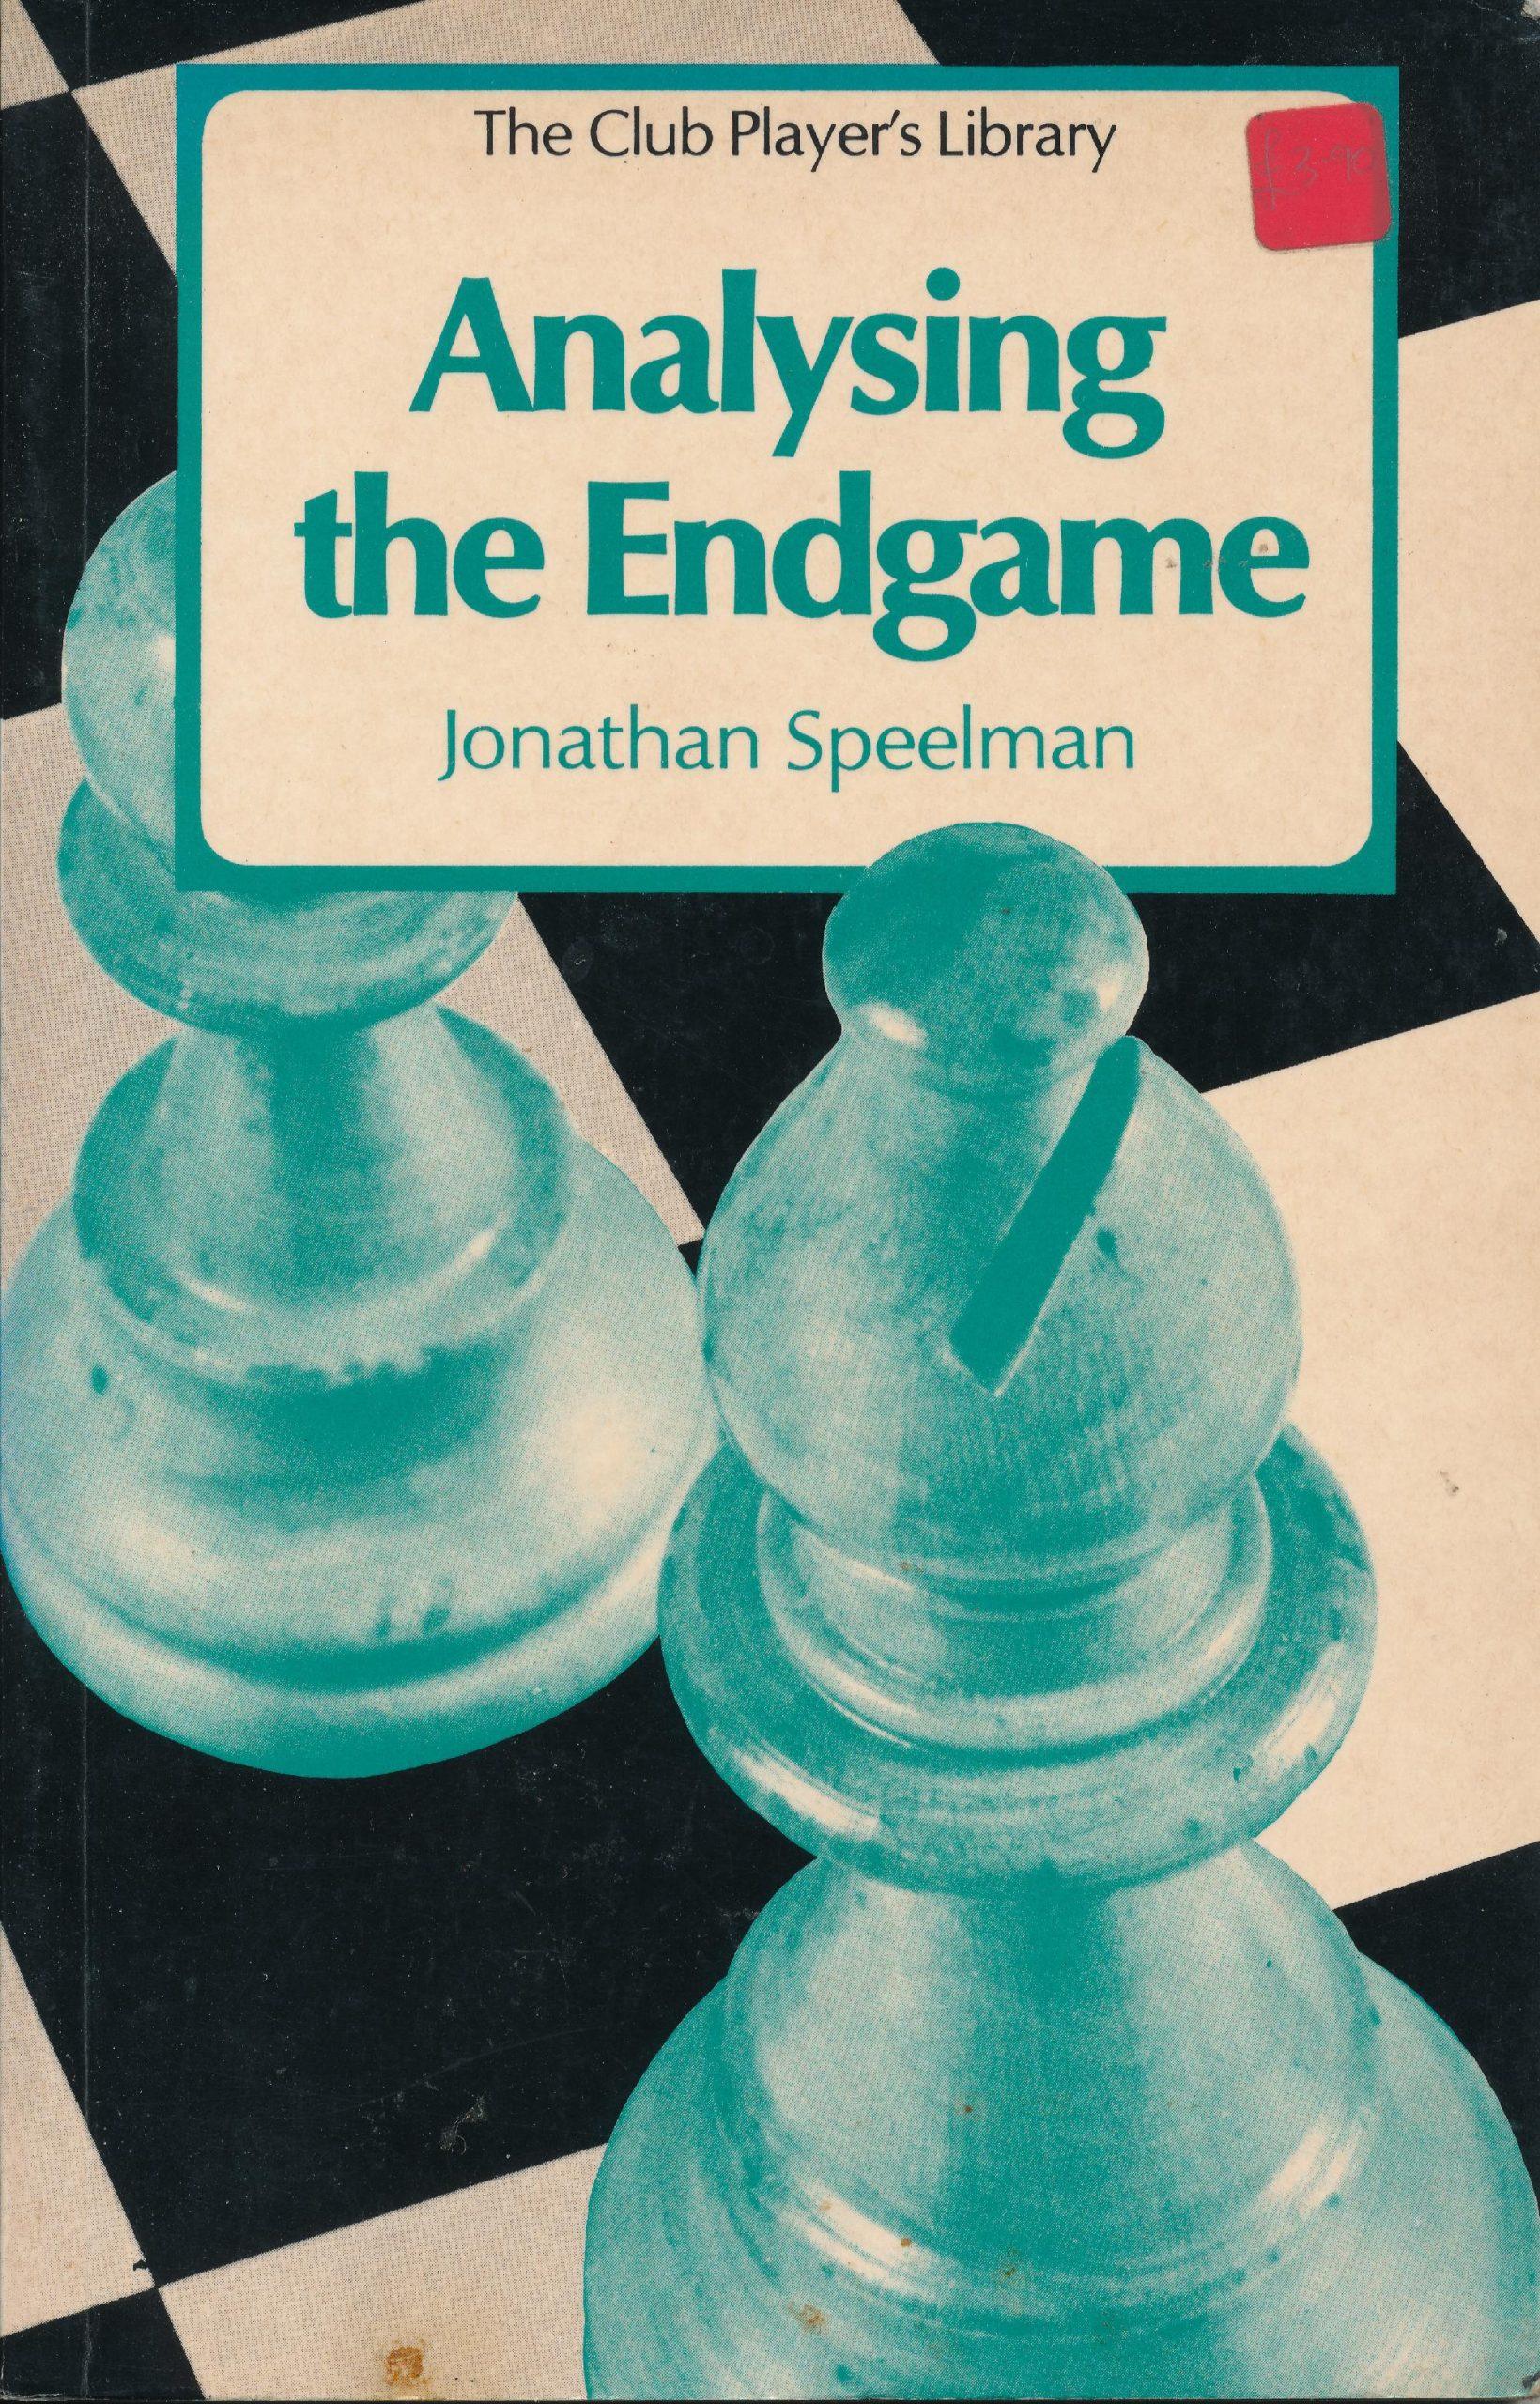 Speelman, Jonathan (1981). Analysing the Endgame. Batsford (London, England). 142 pages. ISBN 978-0-7134-1909-2.